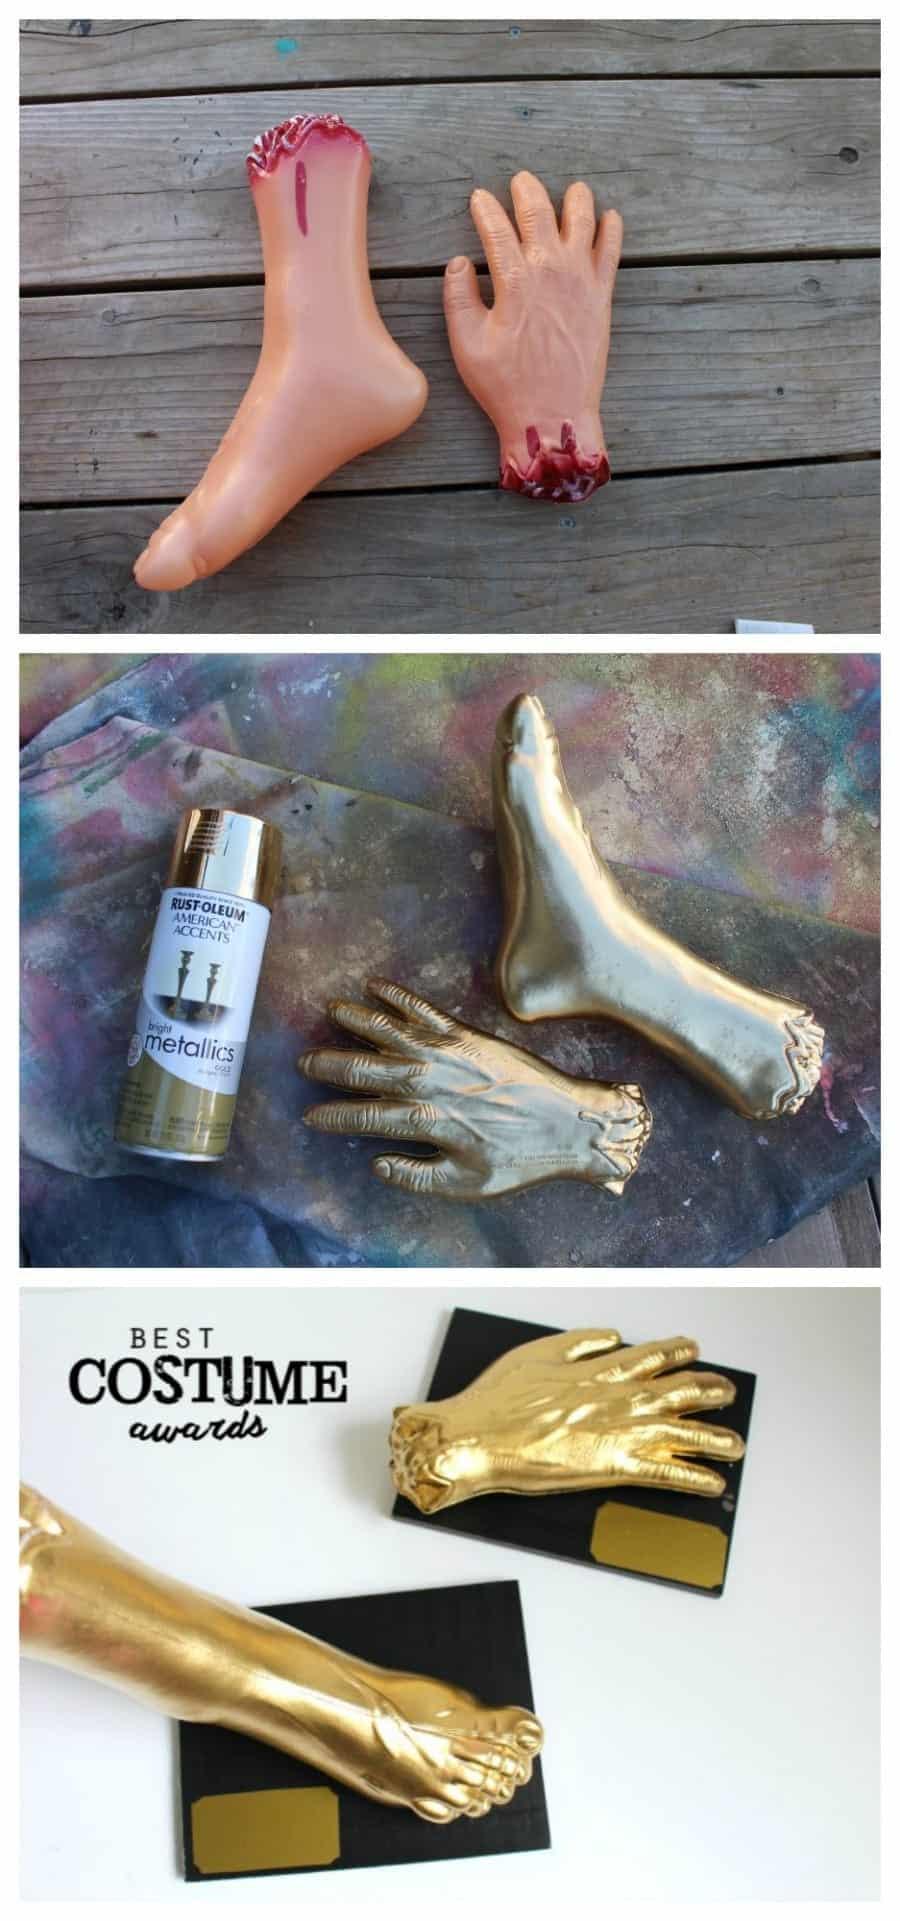 best halloween costume awards